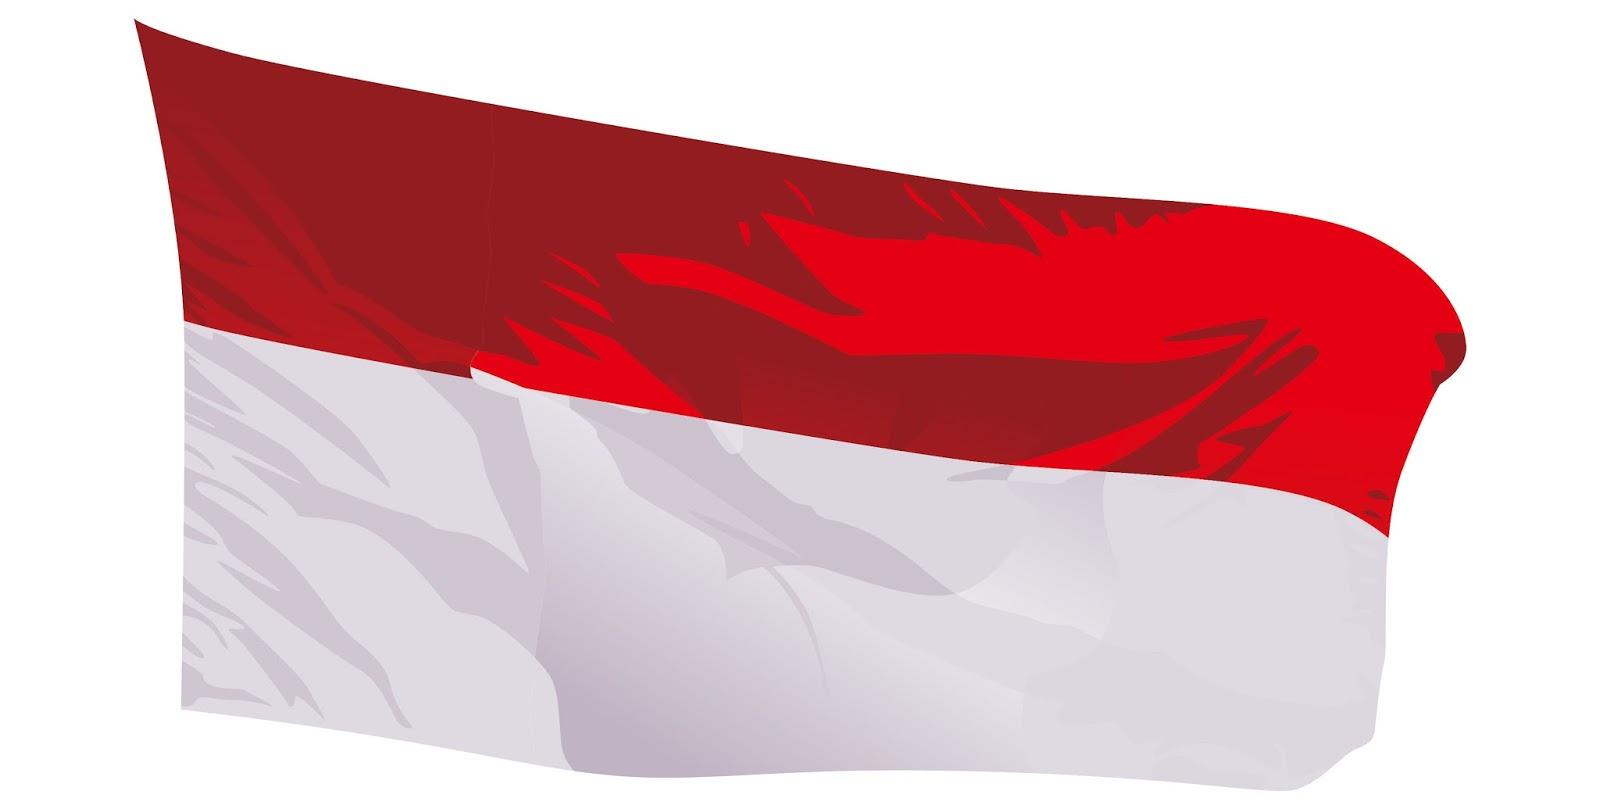 gambar hd bendera merah putih ani gambar gambar hd bendera merah putih ani gambar